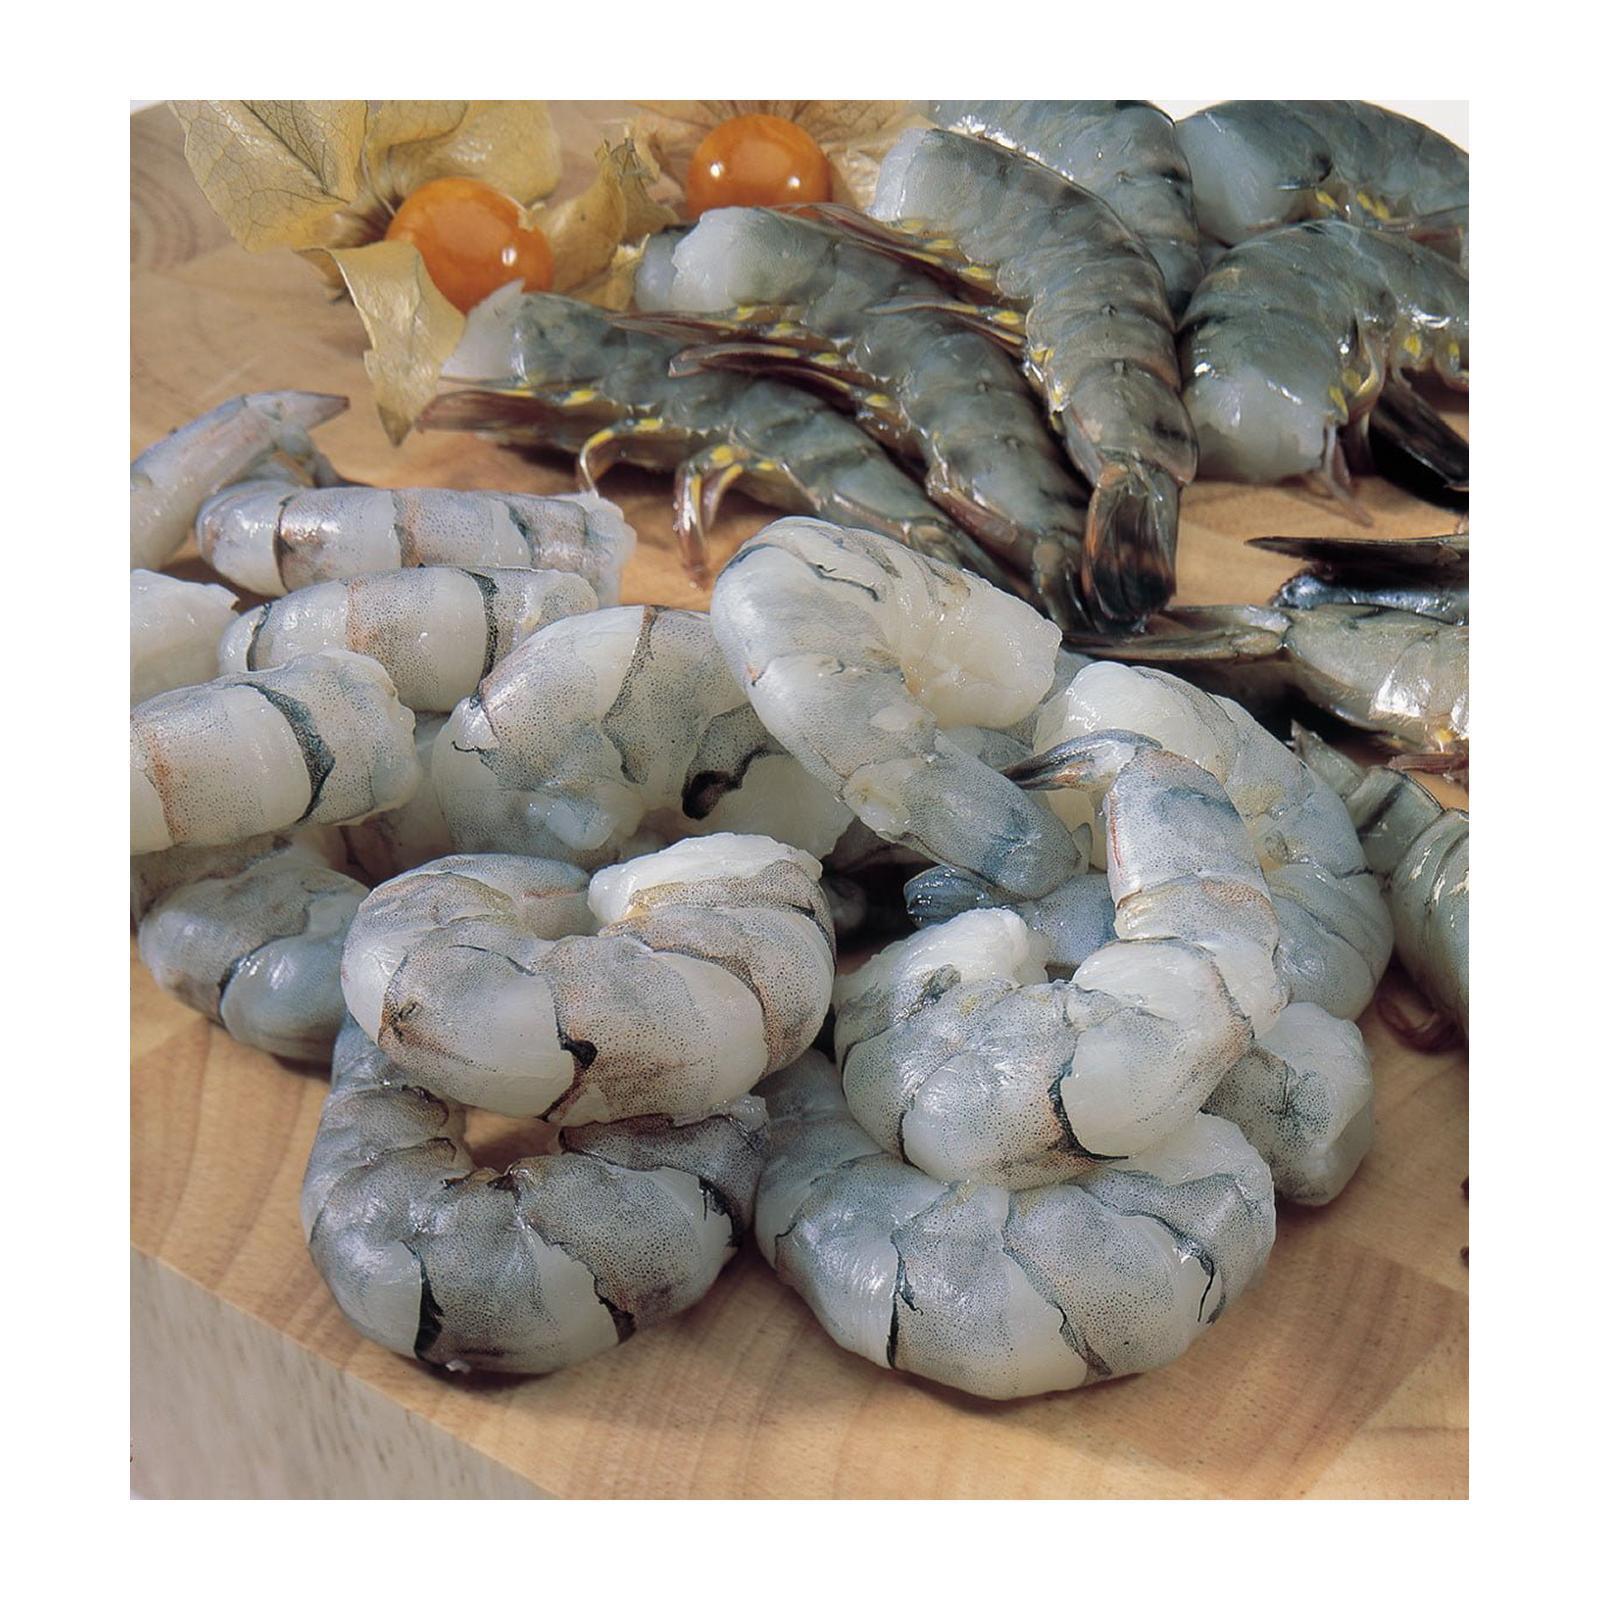 Catch Seafood Jumbo Peeled Prawns - Frozen